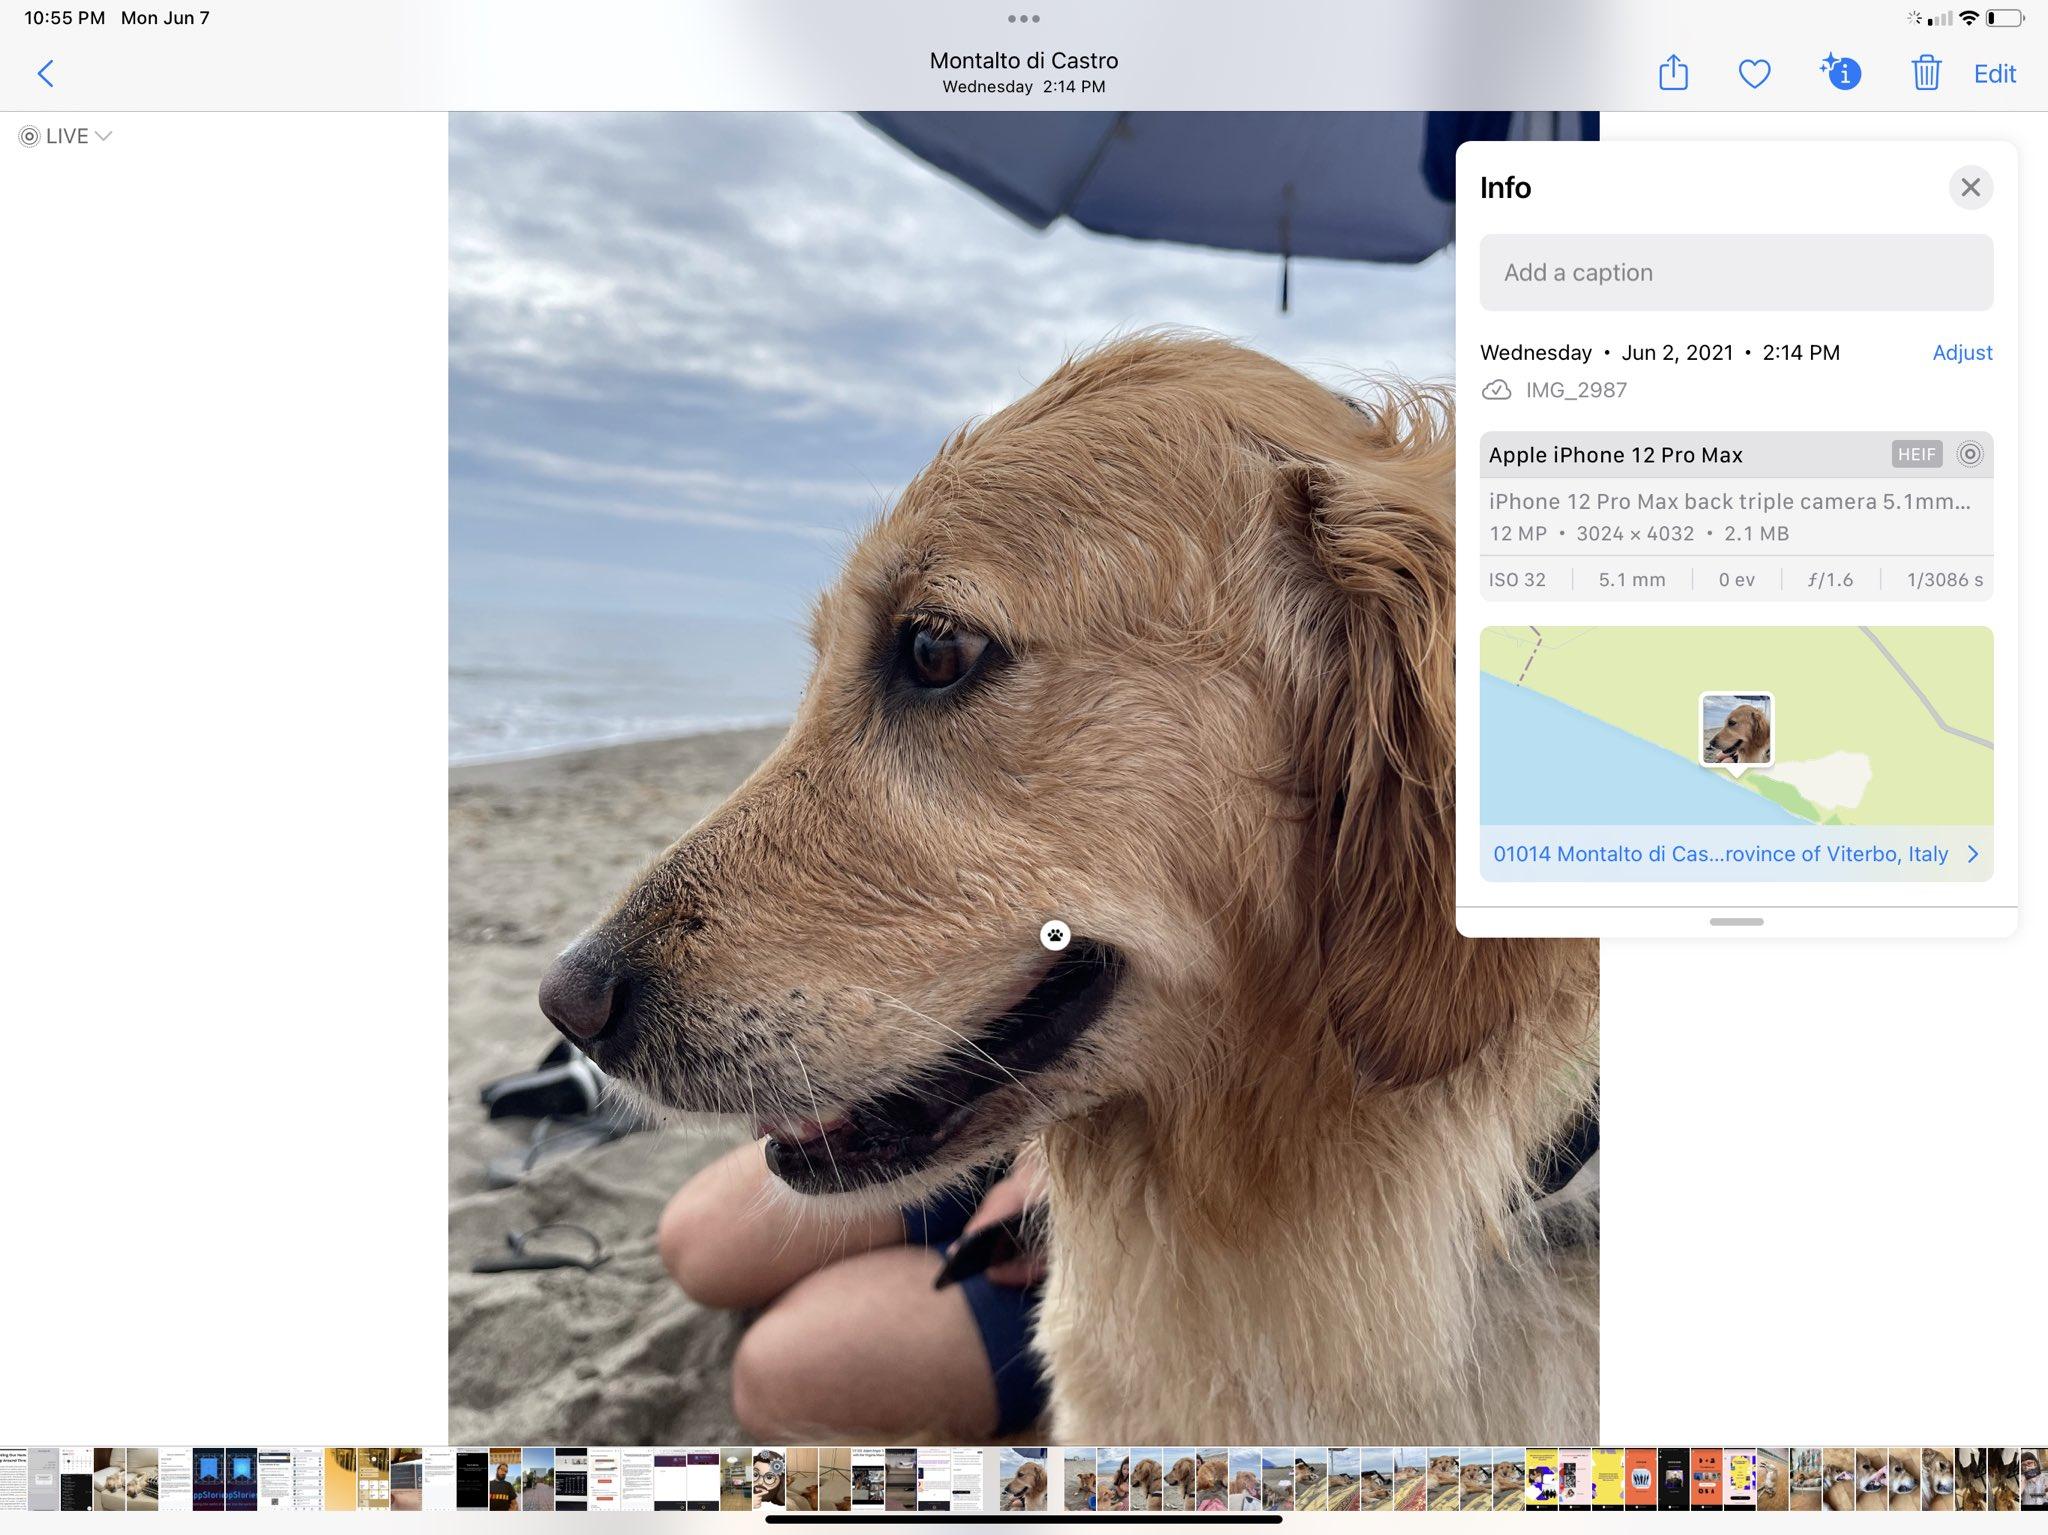 Metadados EXIF no iOS/iPad OS 15